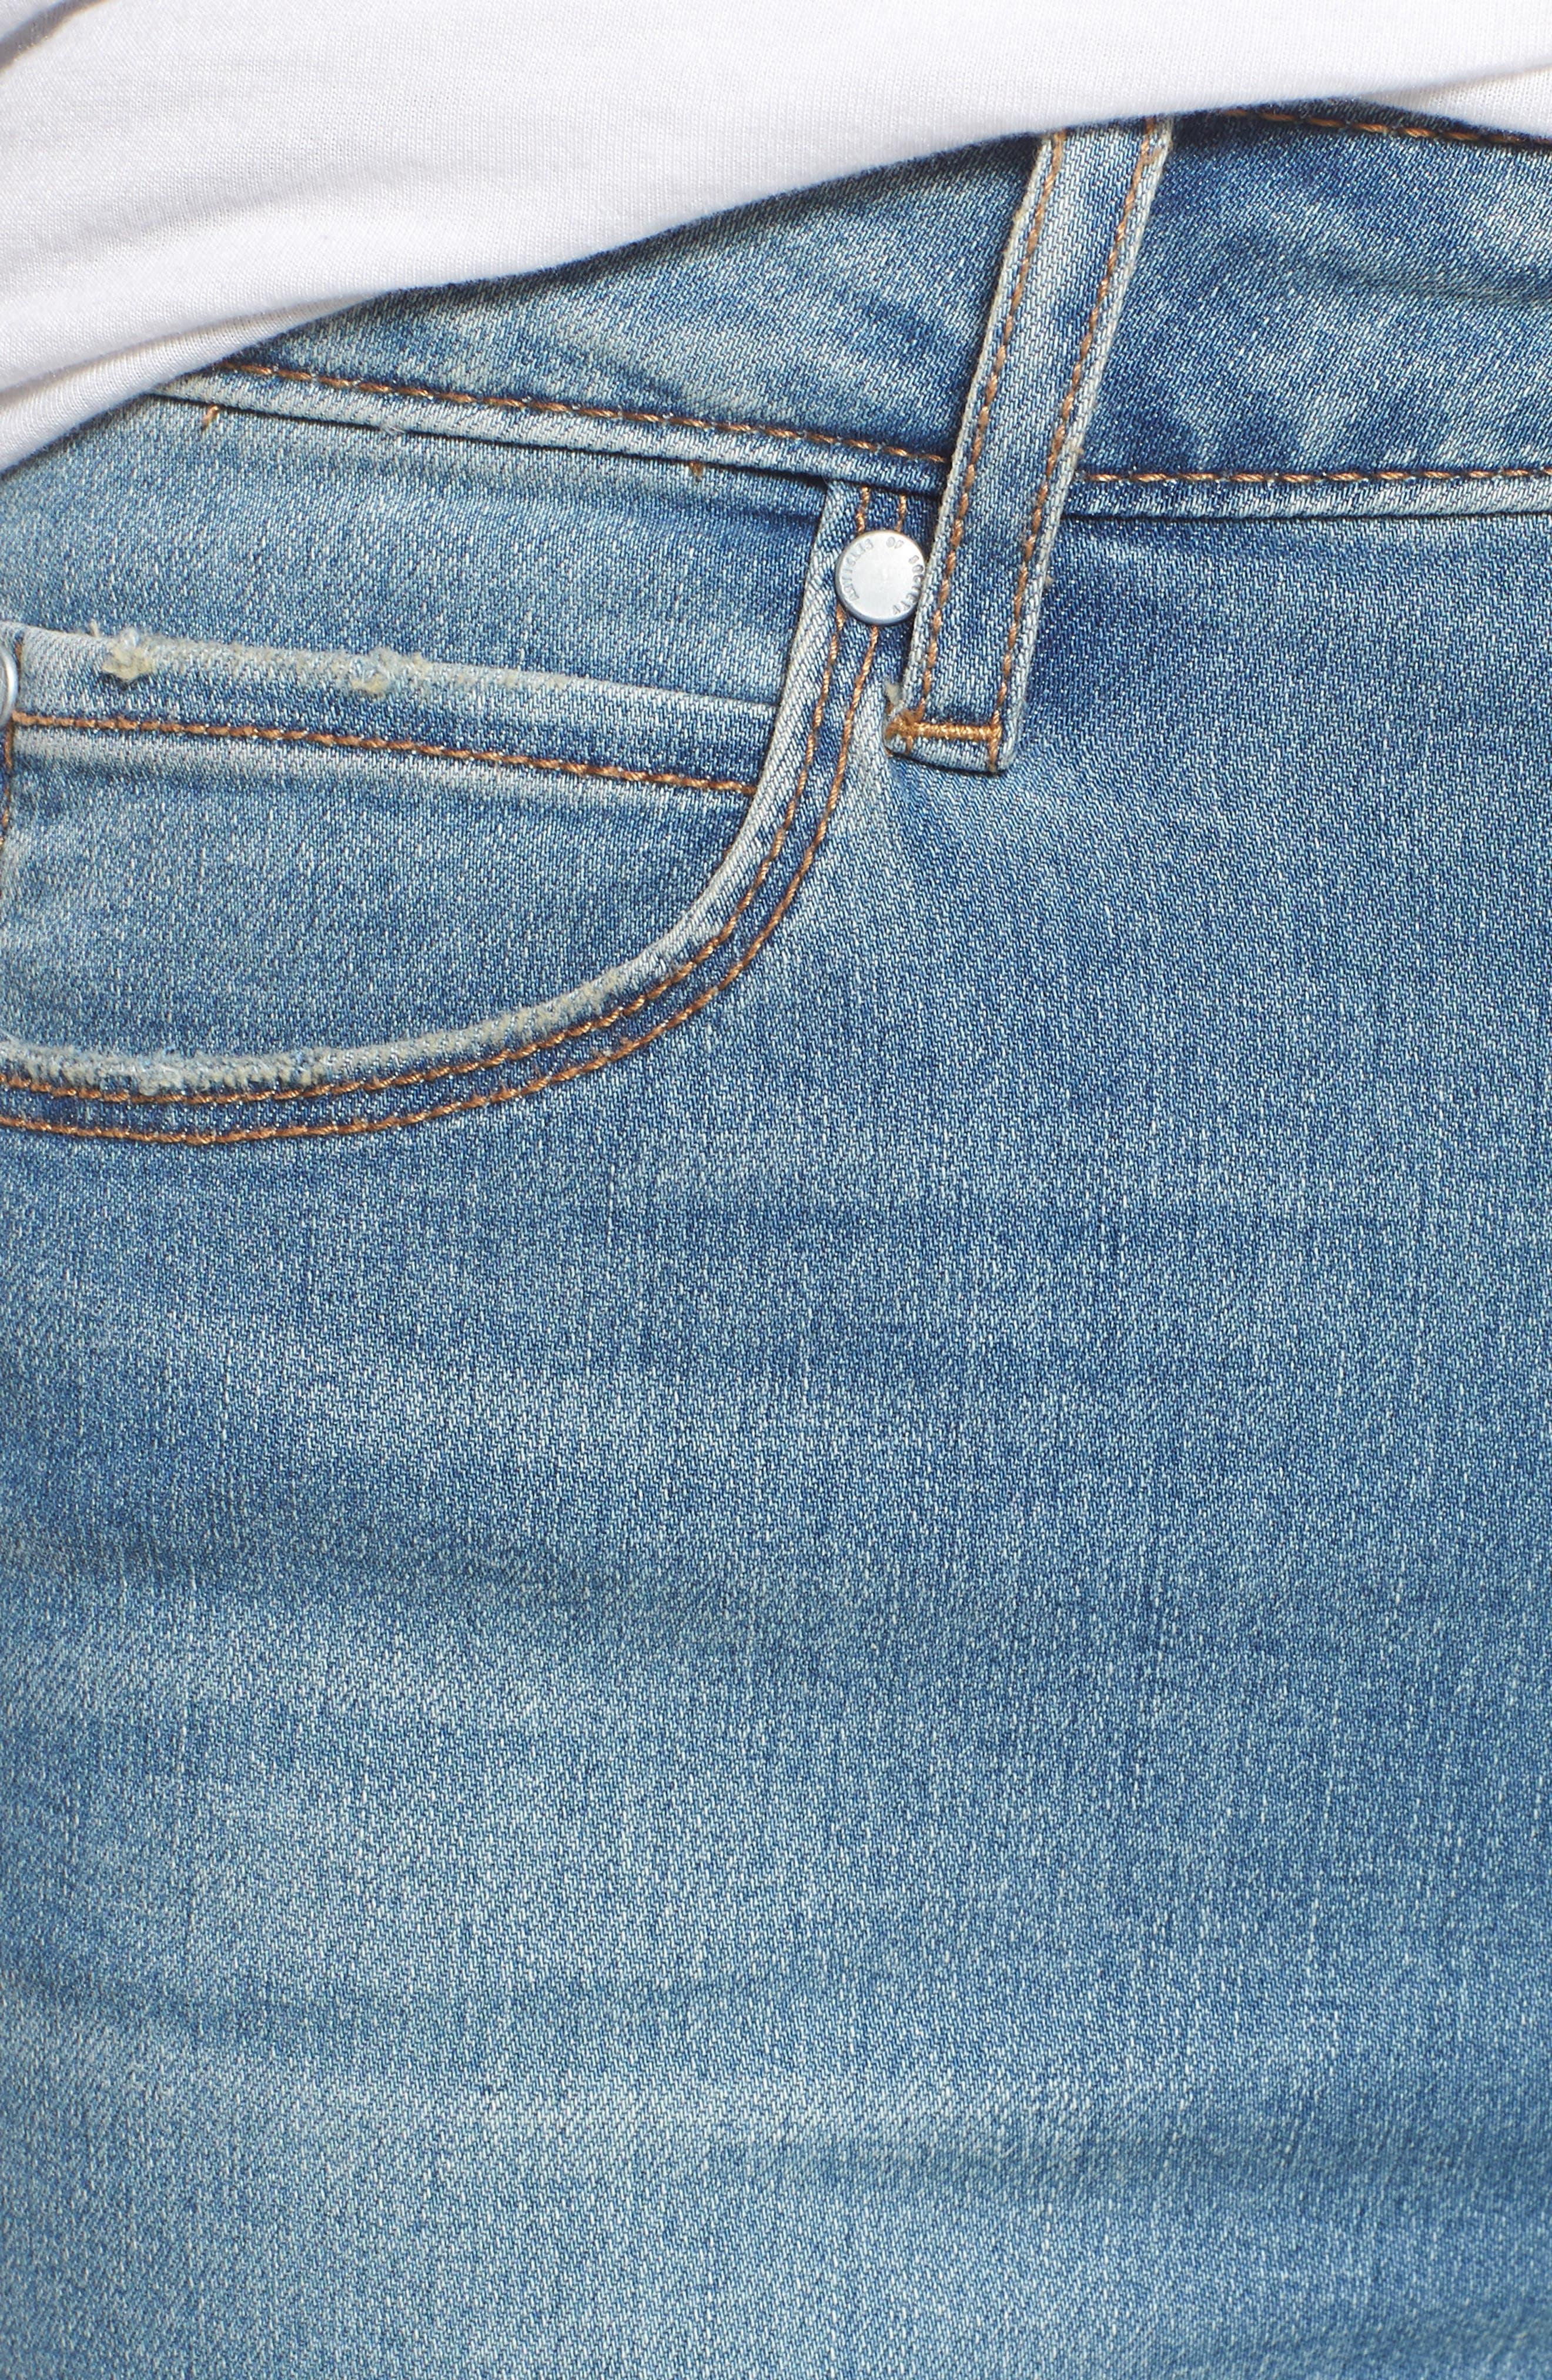 Heather High Waist Skinny Jeans,                             Alternate thumbnail 6, color,                             481